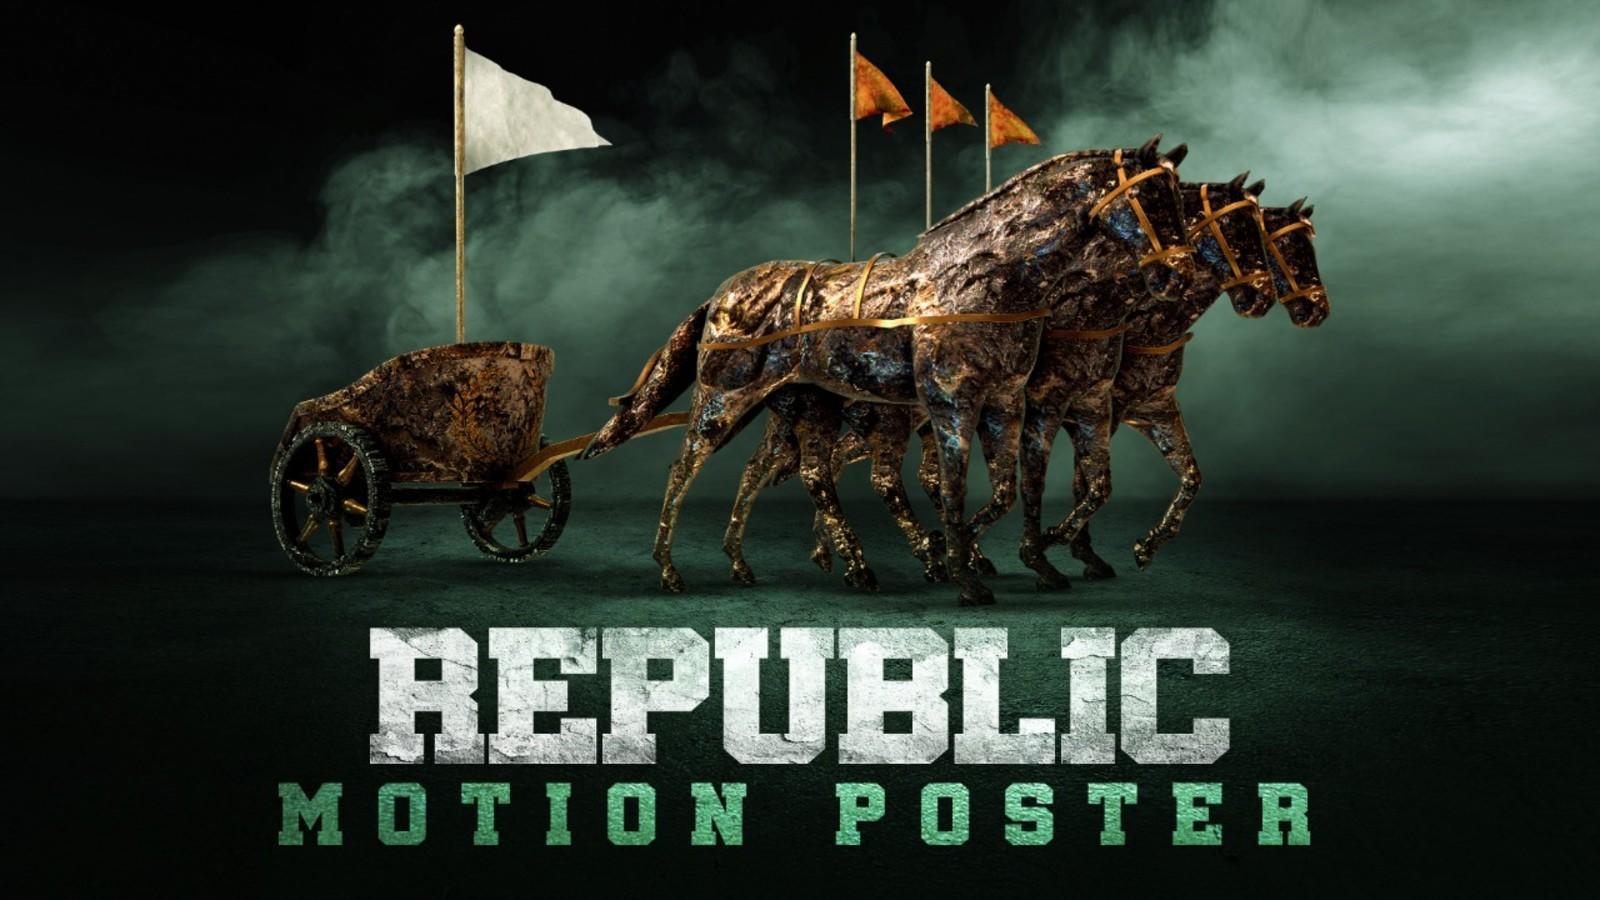 Revealed: The title of Sai Dharam Tej and Deva Katta's next is Republic |  Telugu Movie News - Times of India